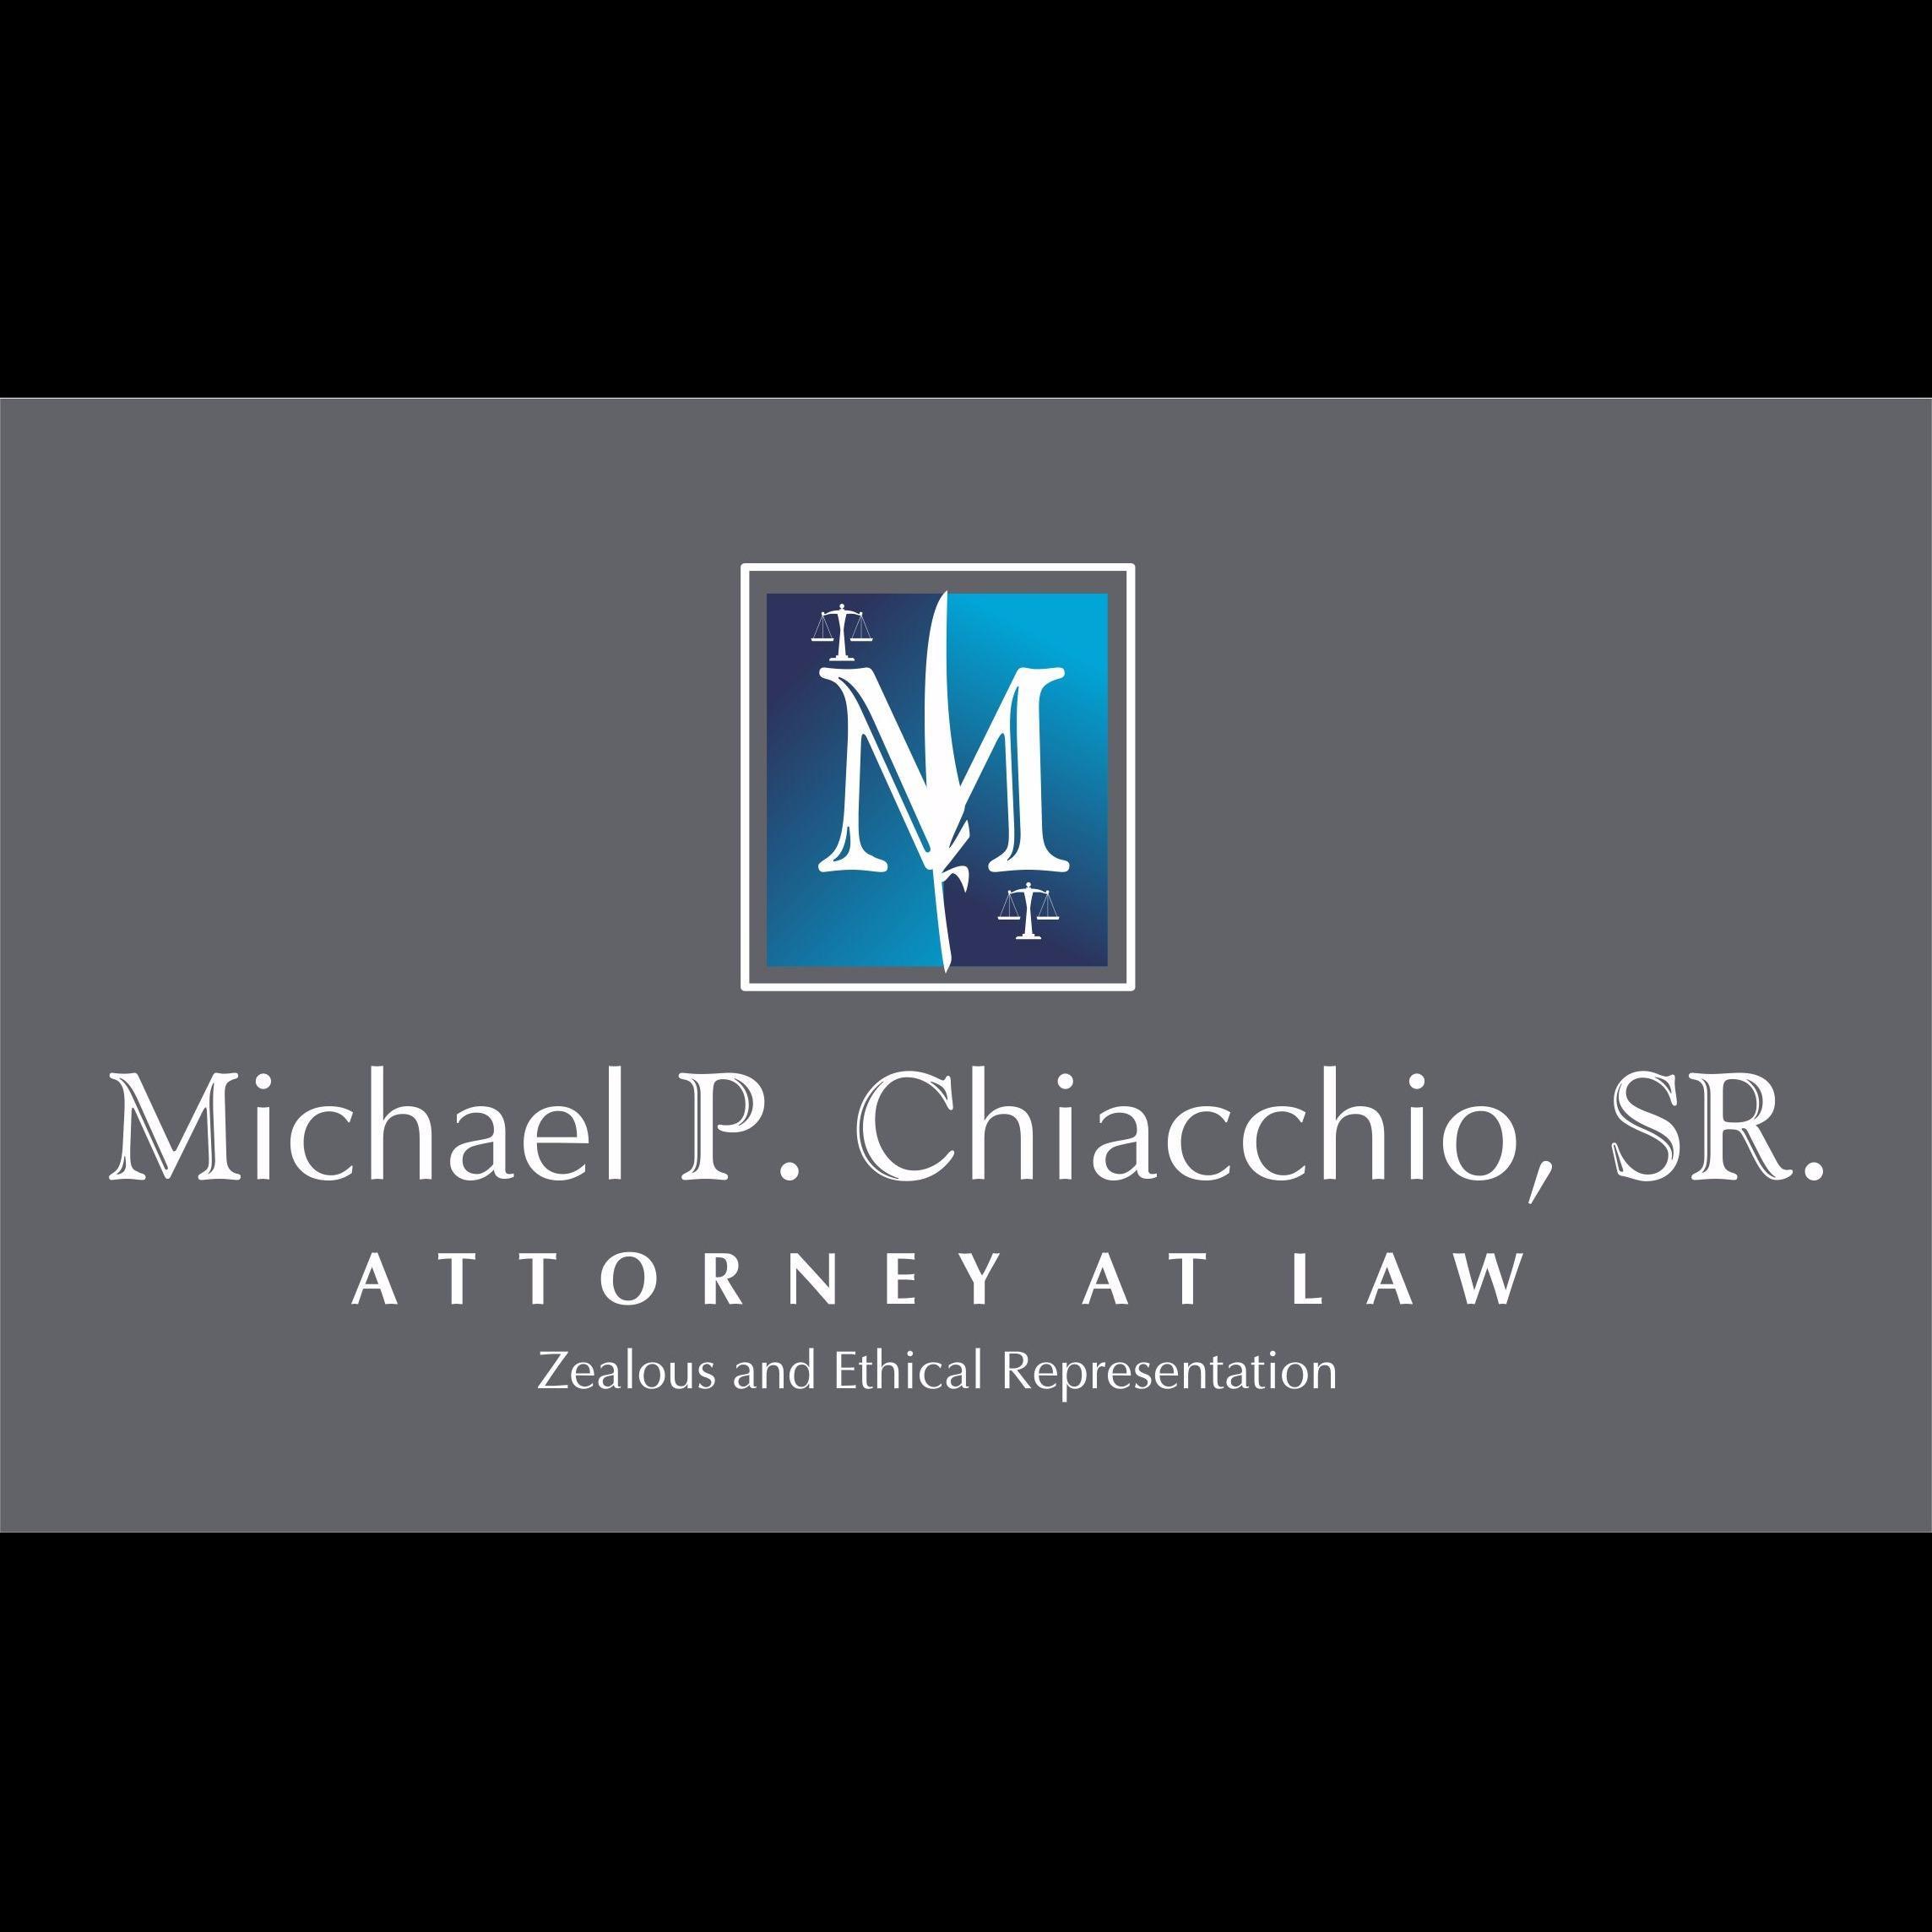 Michael Patrick Chiacchio, Sr., Attorney at Law